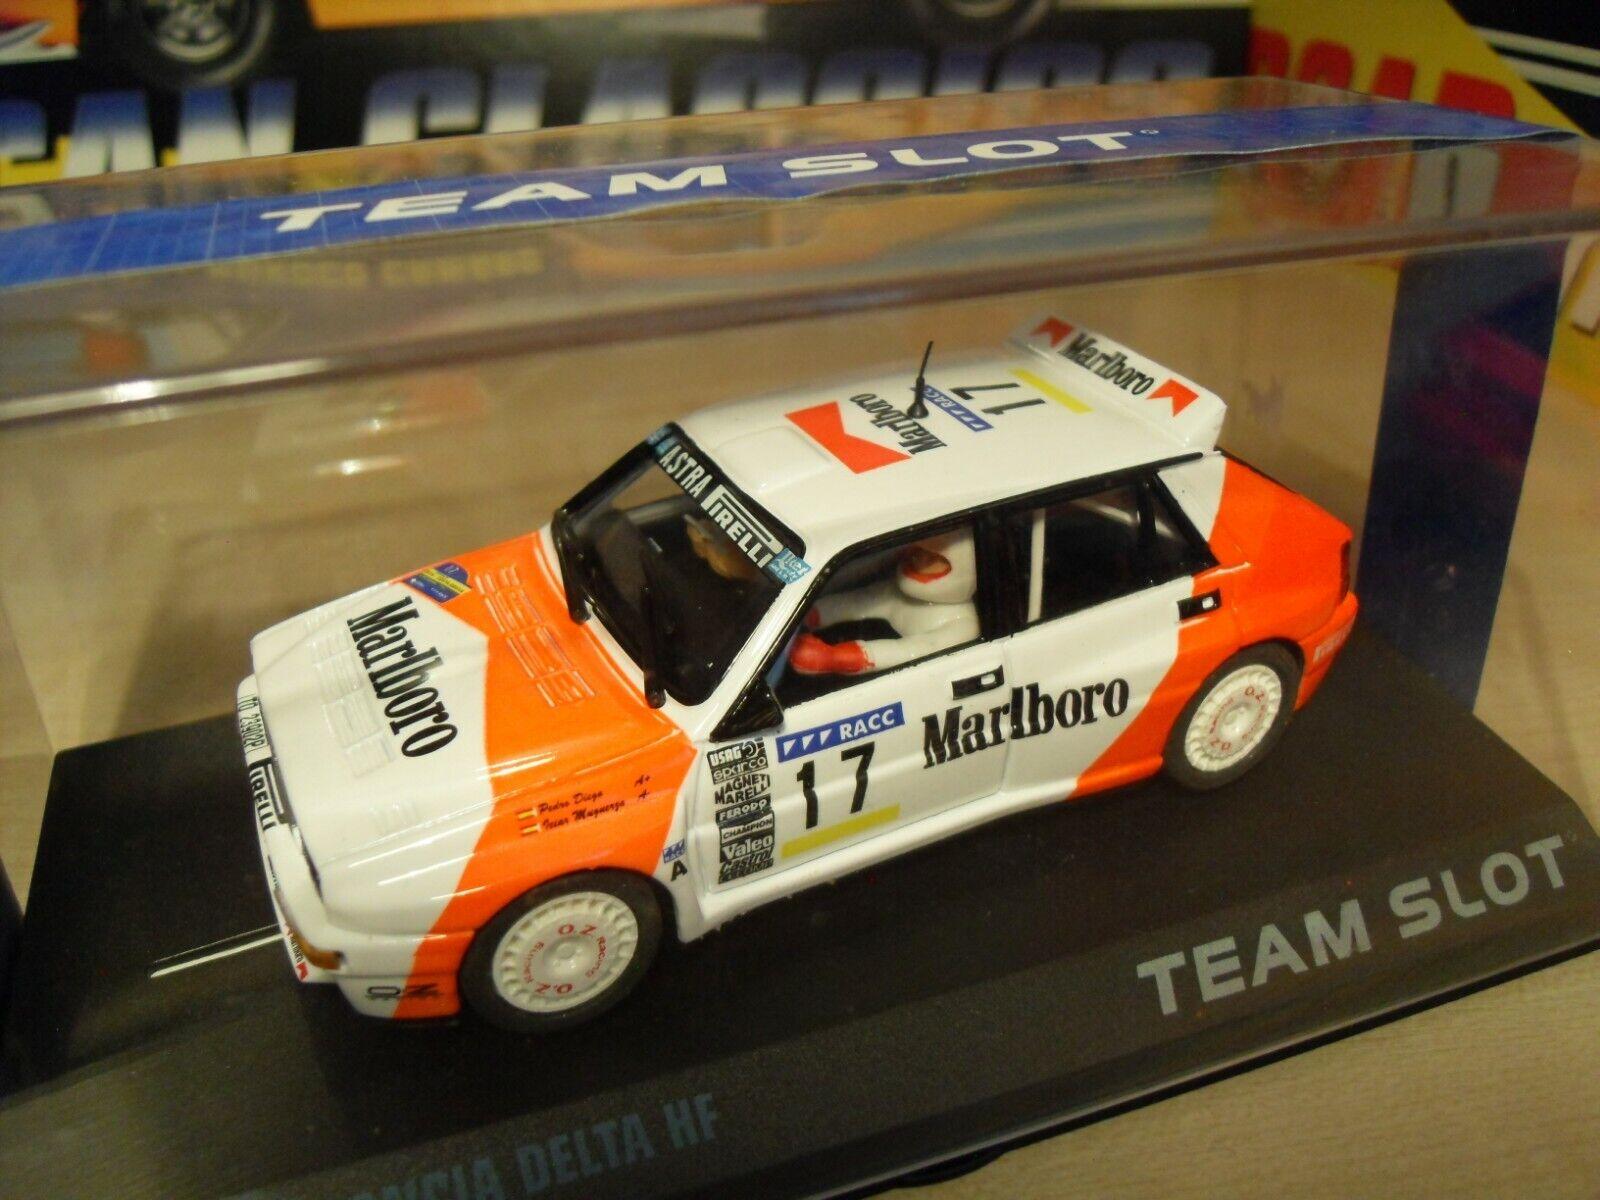 Team Slot 11209 - Lancia Delta HF Integrale - 'Marlbgold' - Brand New in Box.